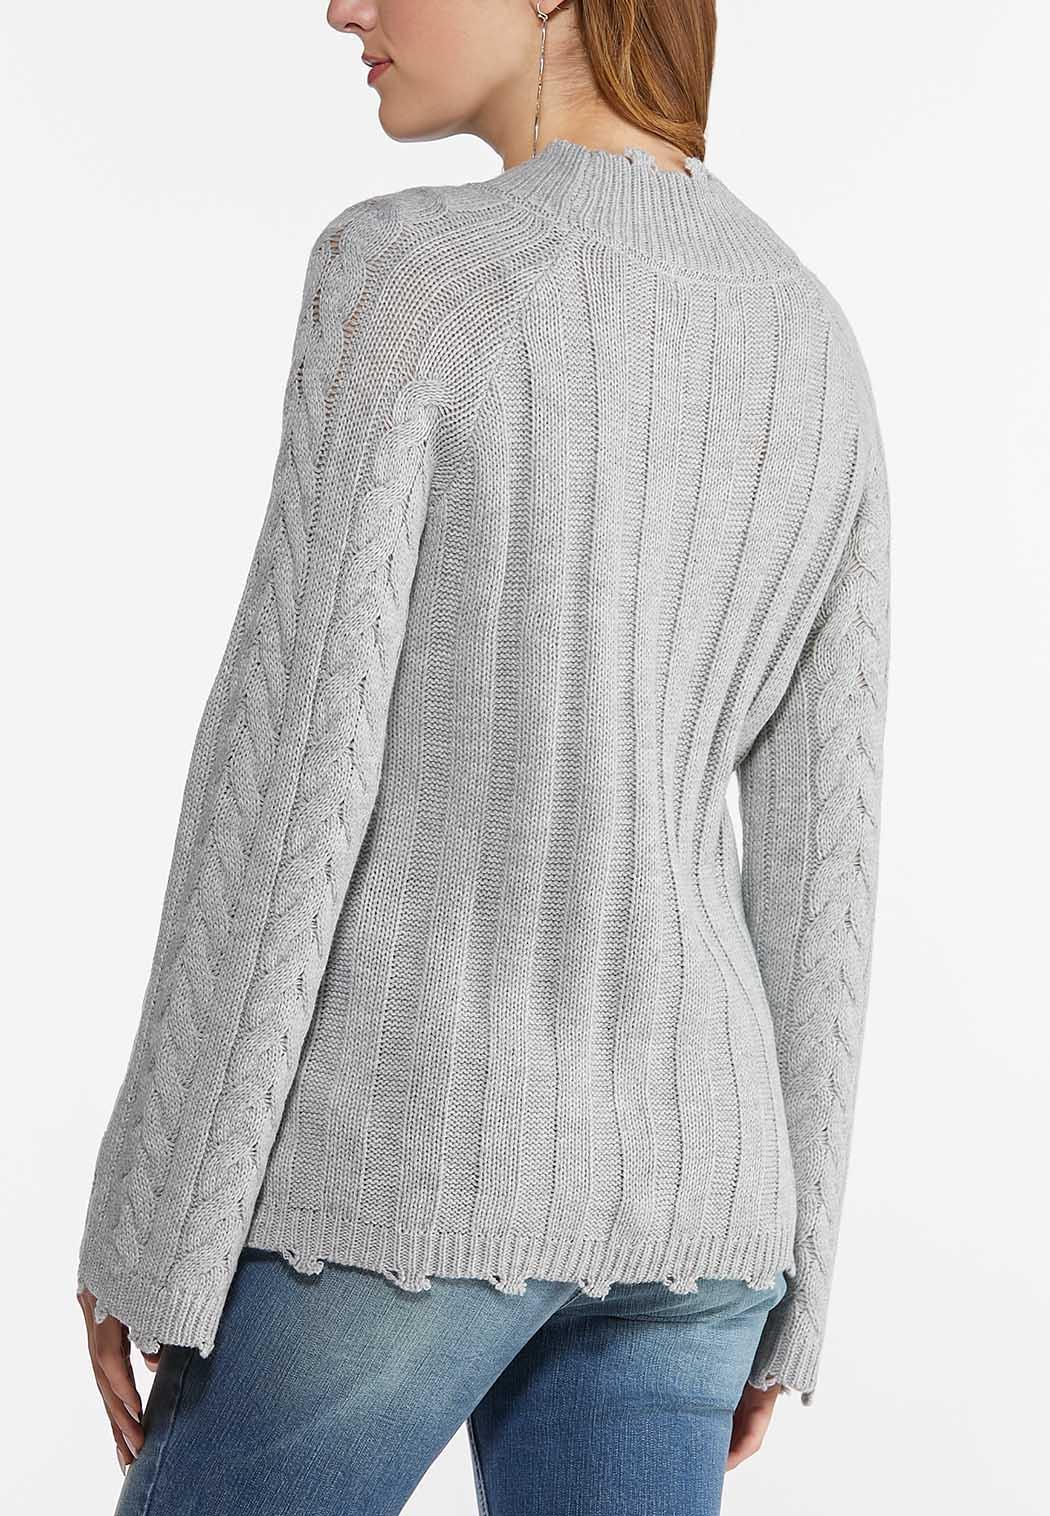 Distressed Trim Sweater (Item #44469900)